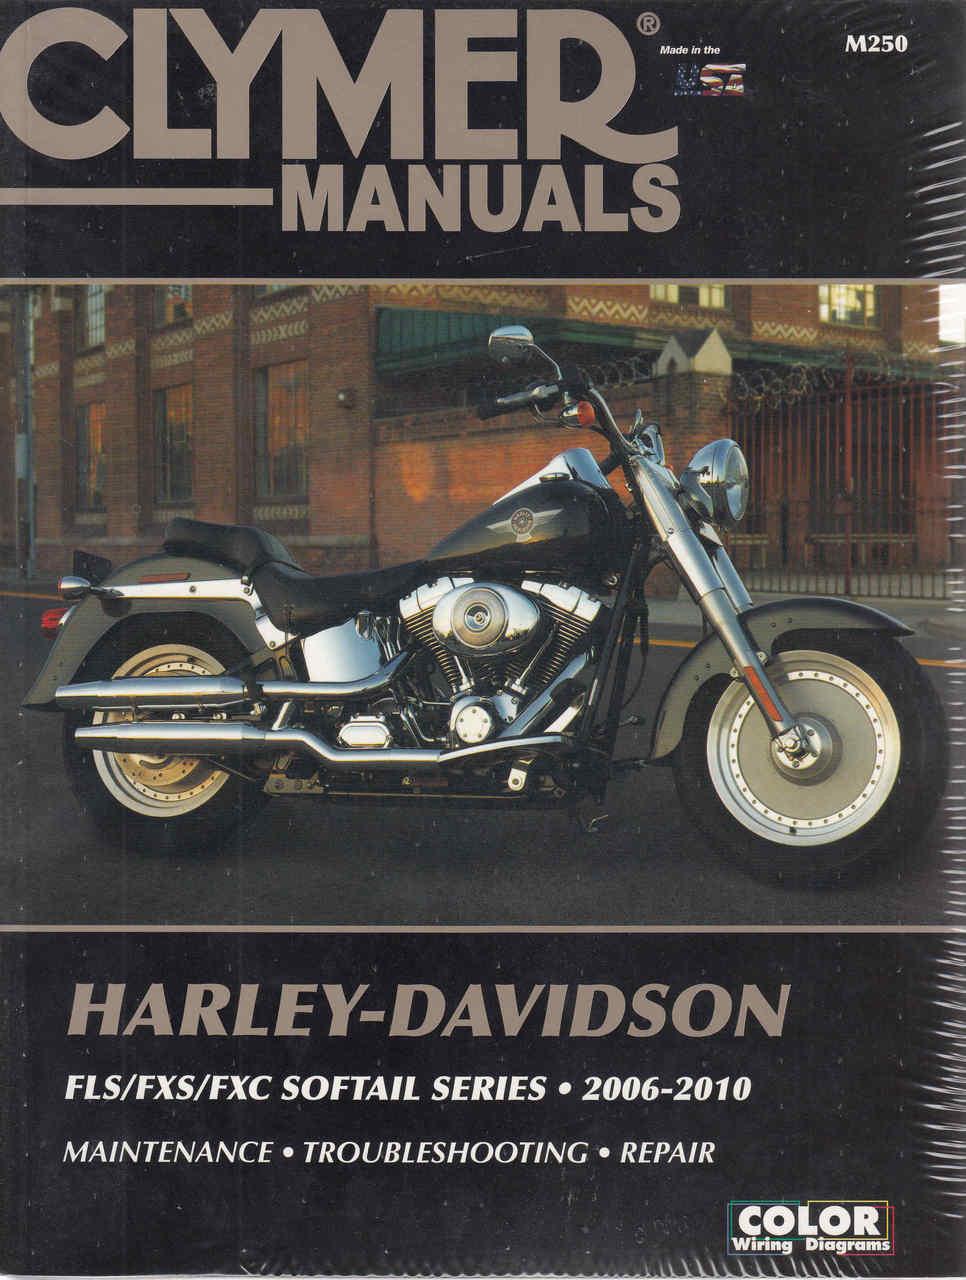 98 Flstc Harley Davidson Motorcycle Diagrams - Machine ... on